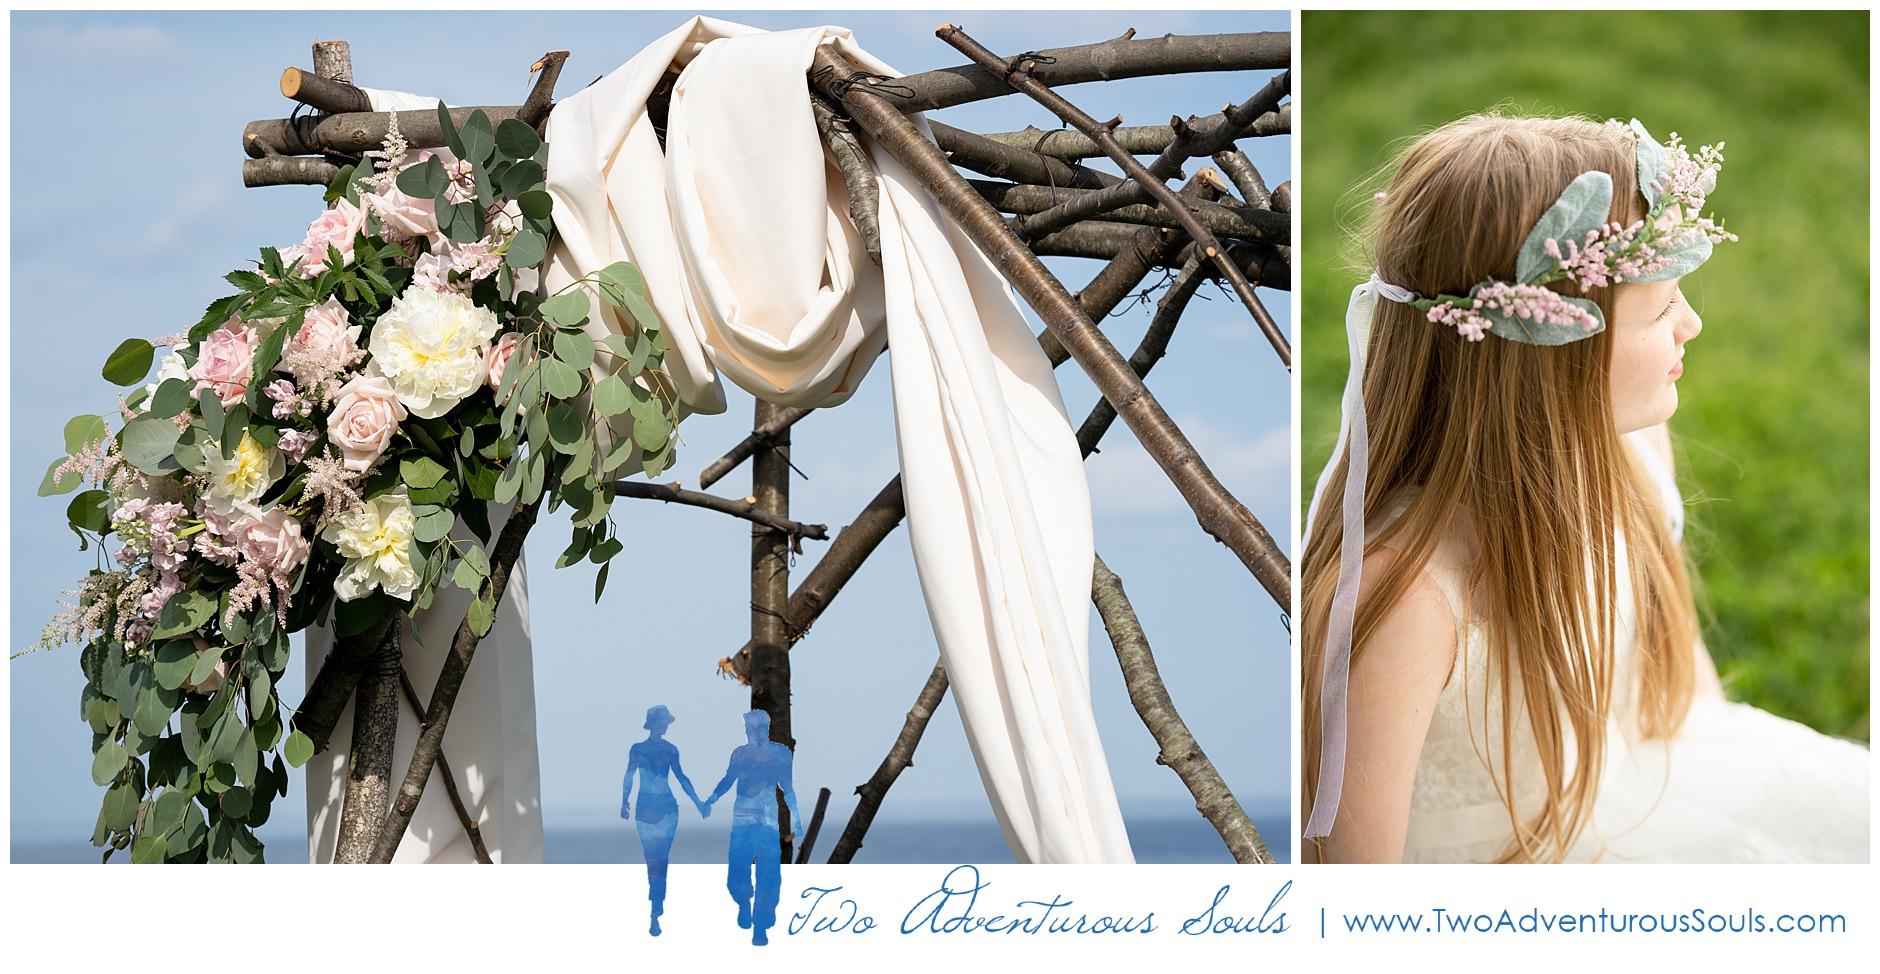 Maine Wedding Photographers, Stage Neck Inn Wedding Photographers, Two Adventurous Souls, 51819_0011.jpg